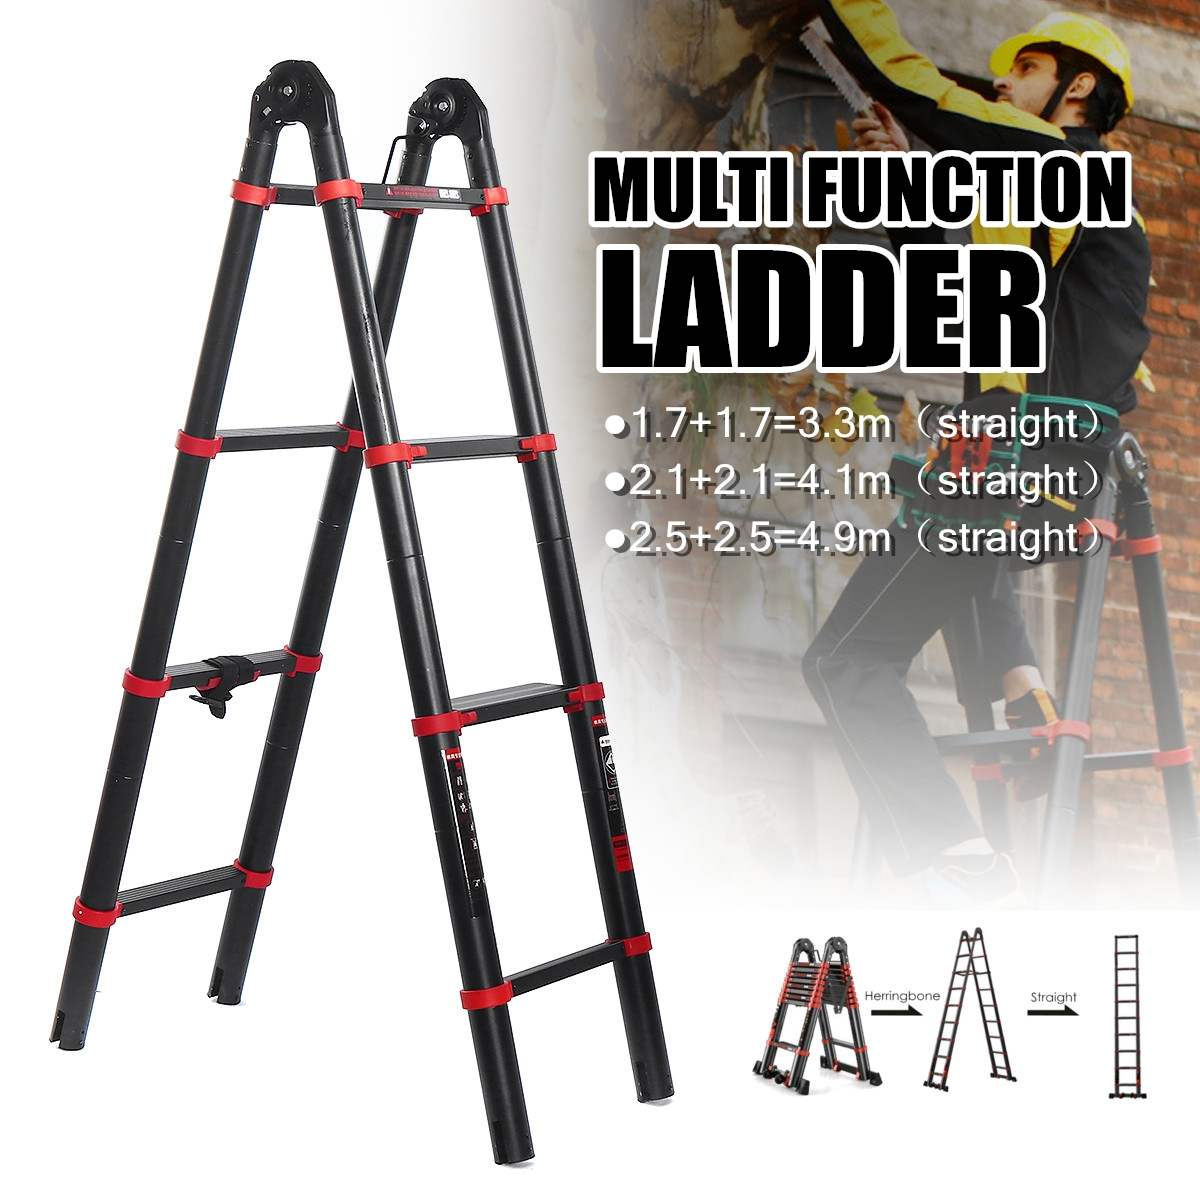 5 StepsTelescoping Dual-Use Herringbone Ladder Multifunctional Extension Tools Width 82mm Aluminium Ladders  4.1M